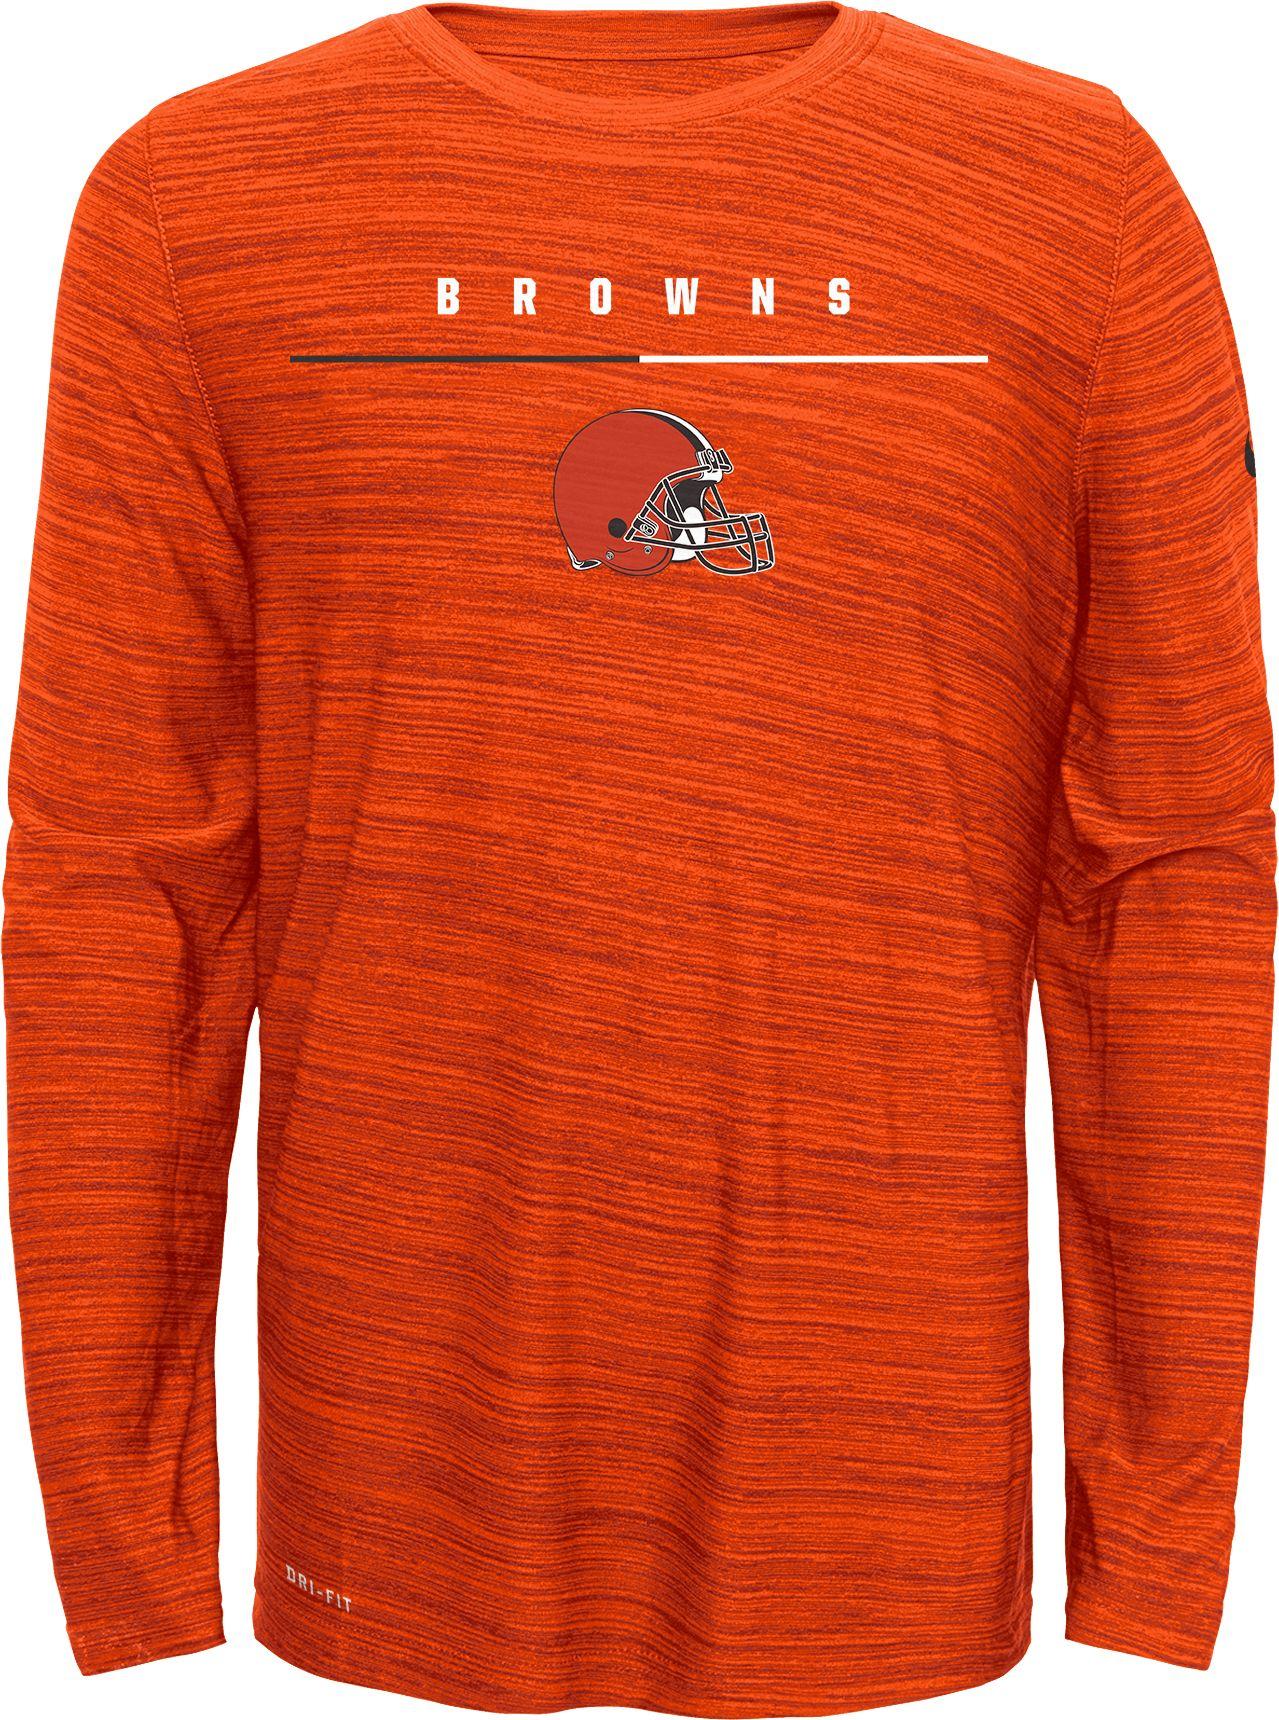 cleveland browns long sleeve shirt